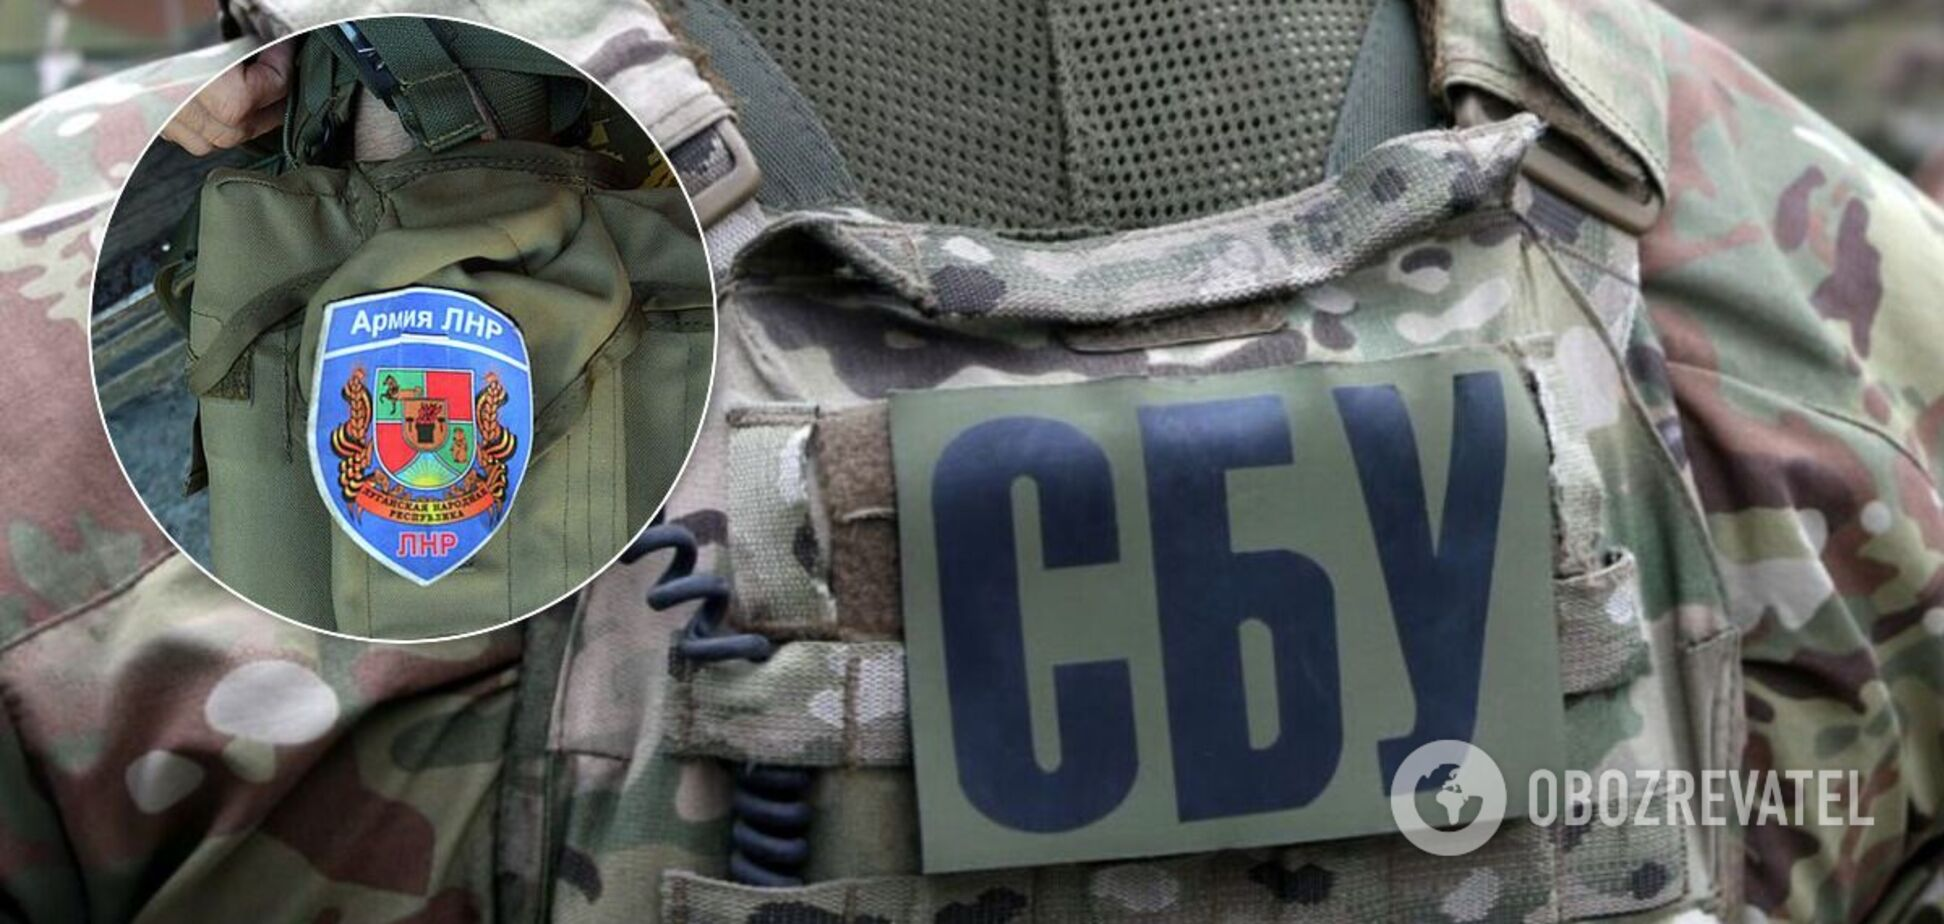 СБУ задержала луганчанина-разведчика 'ЛНР'